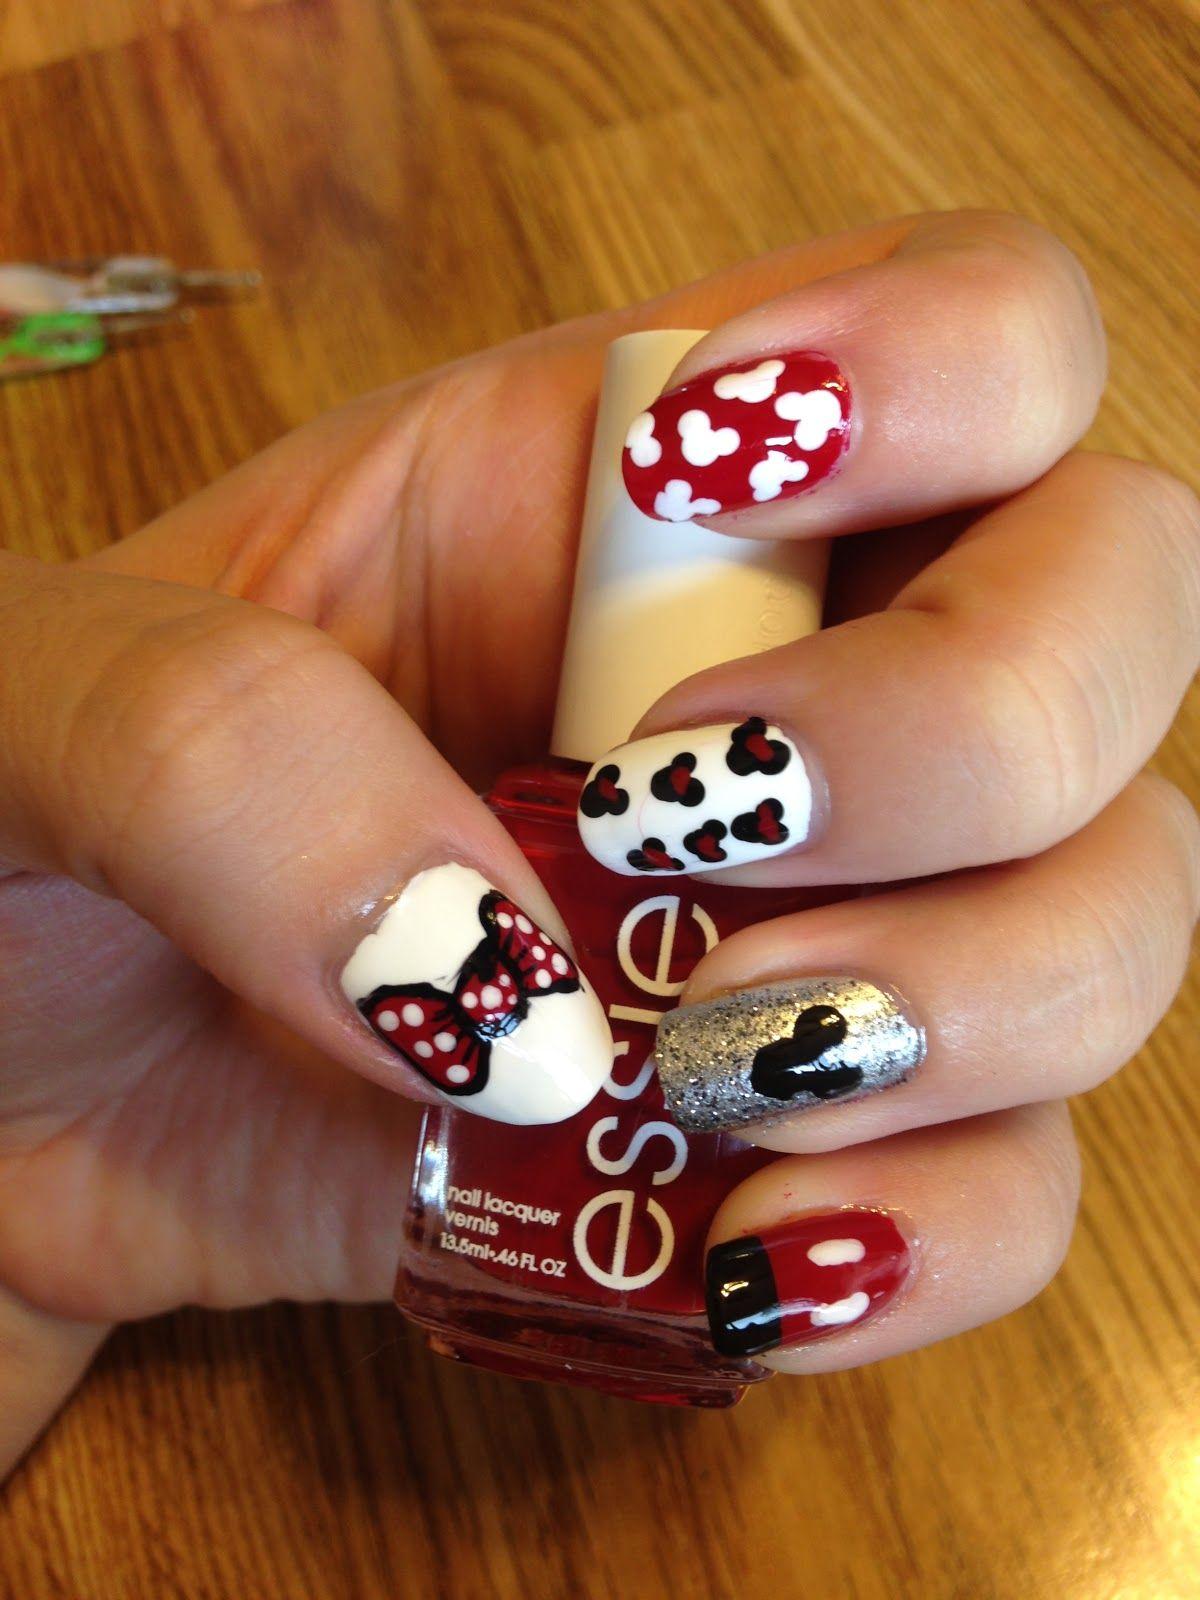 Curlyhaired Nail Designs: Disney Themed Nail Art Tutorial ºoº - Nail ...